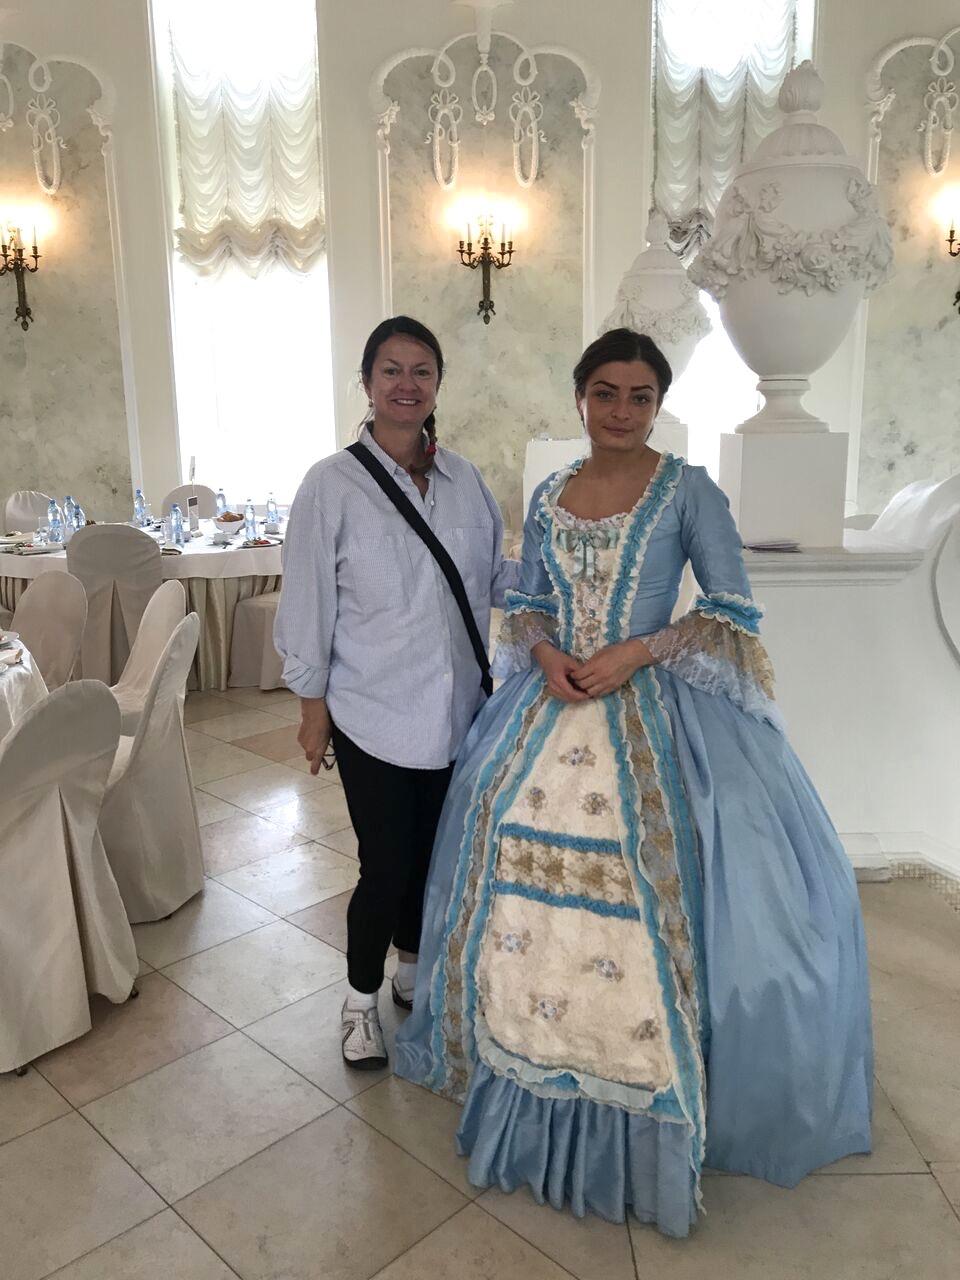 Teri_St.Petersburg_Hermitage_day2_spiritedtable_photo30.jpg